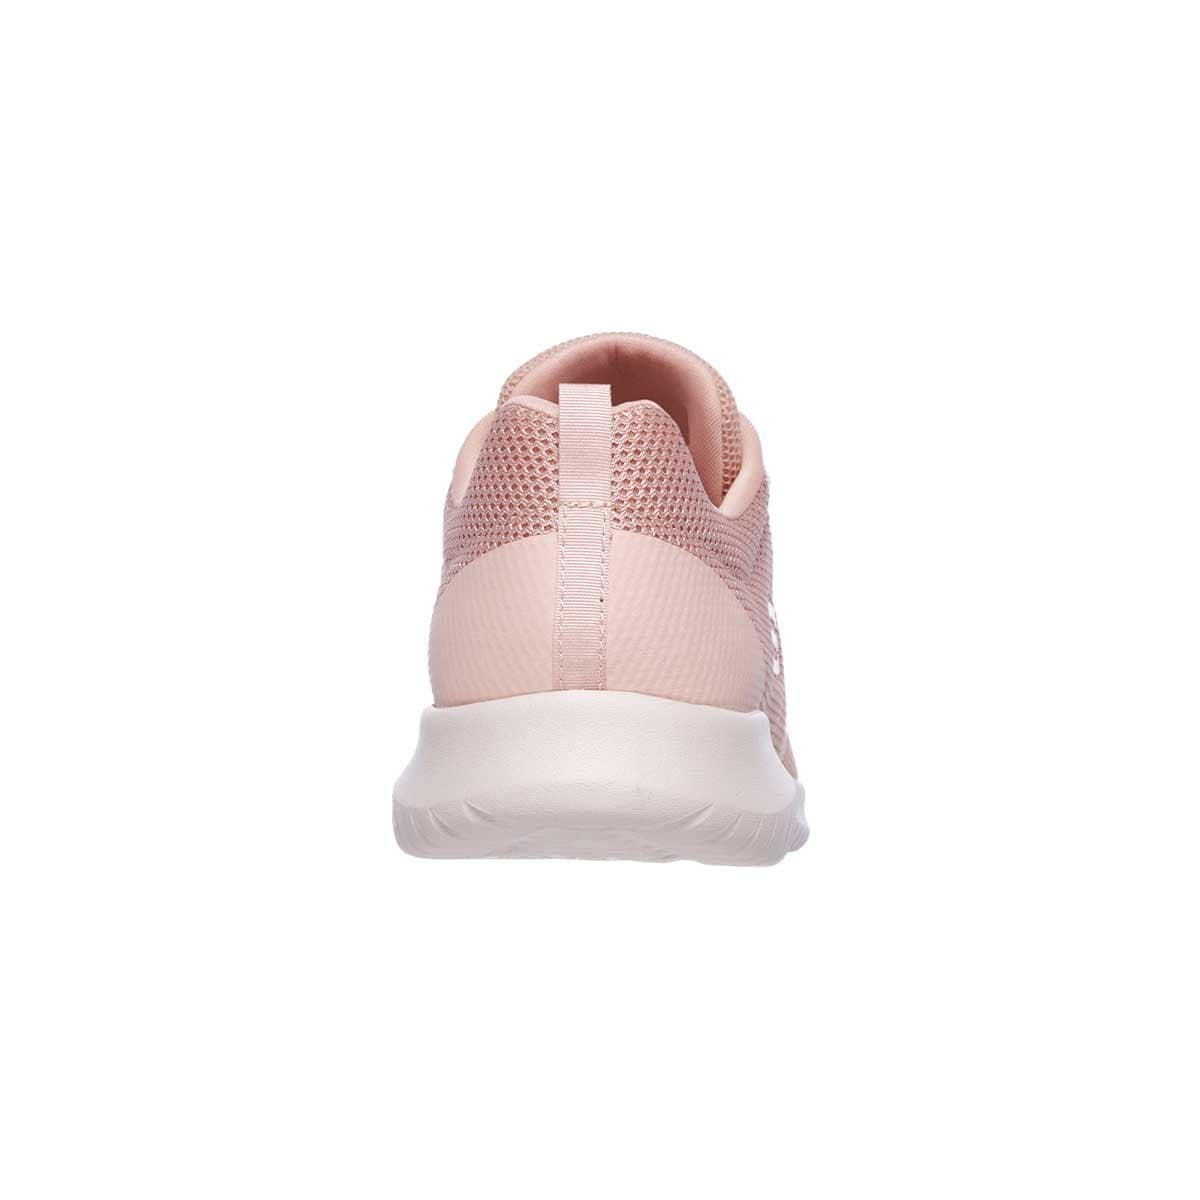 Tenis Liso Suela Blanca Skechers